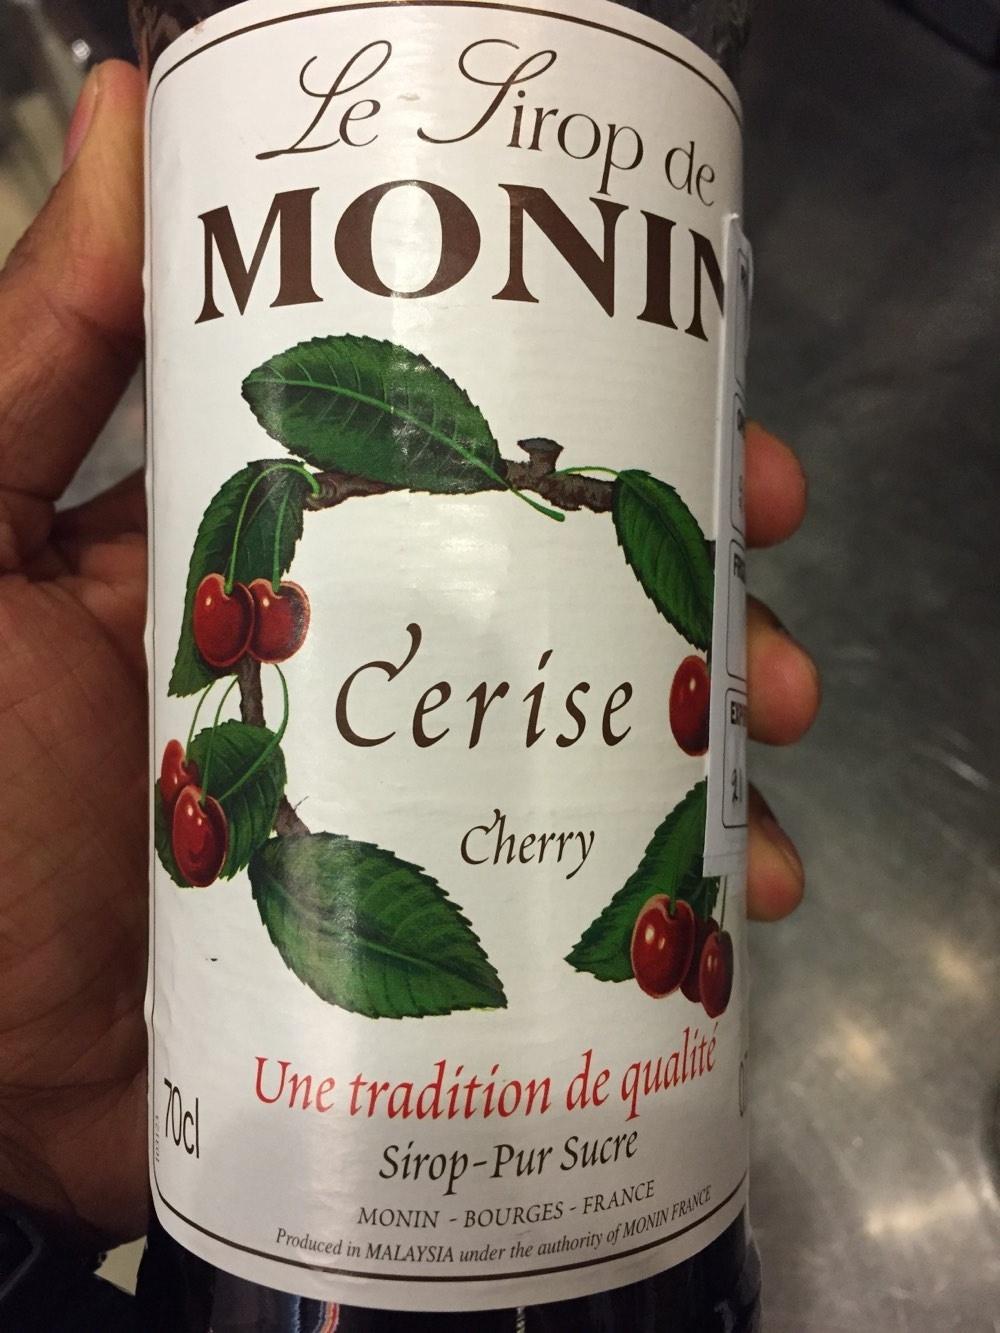 Le sirop de Monin  cerise - Produit - fr